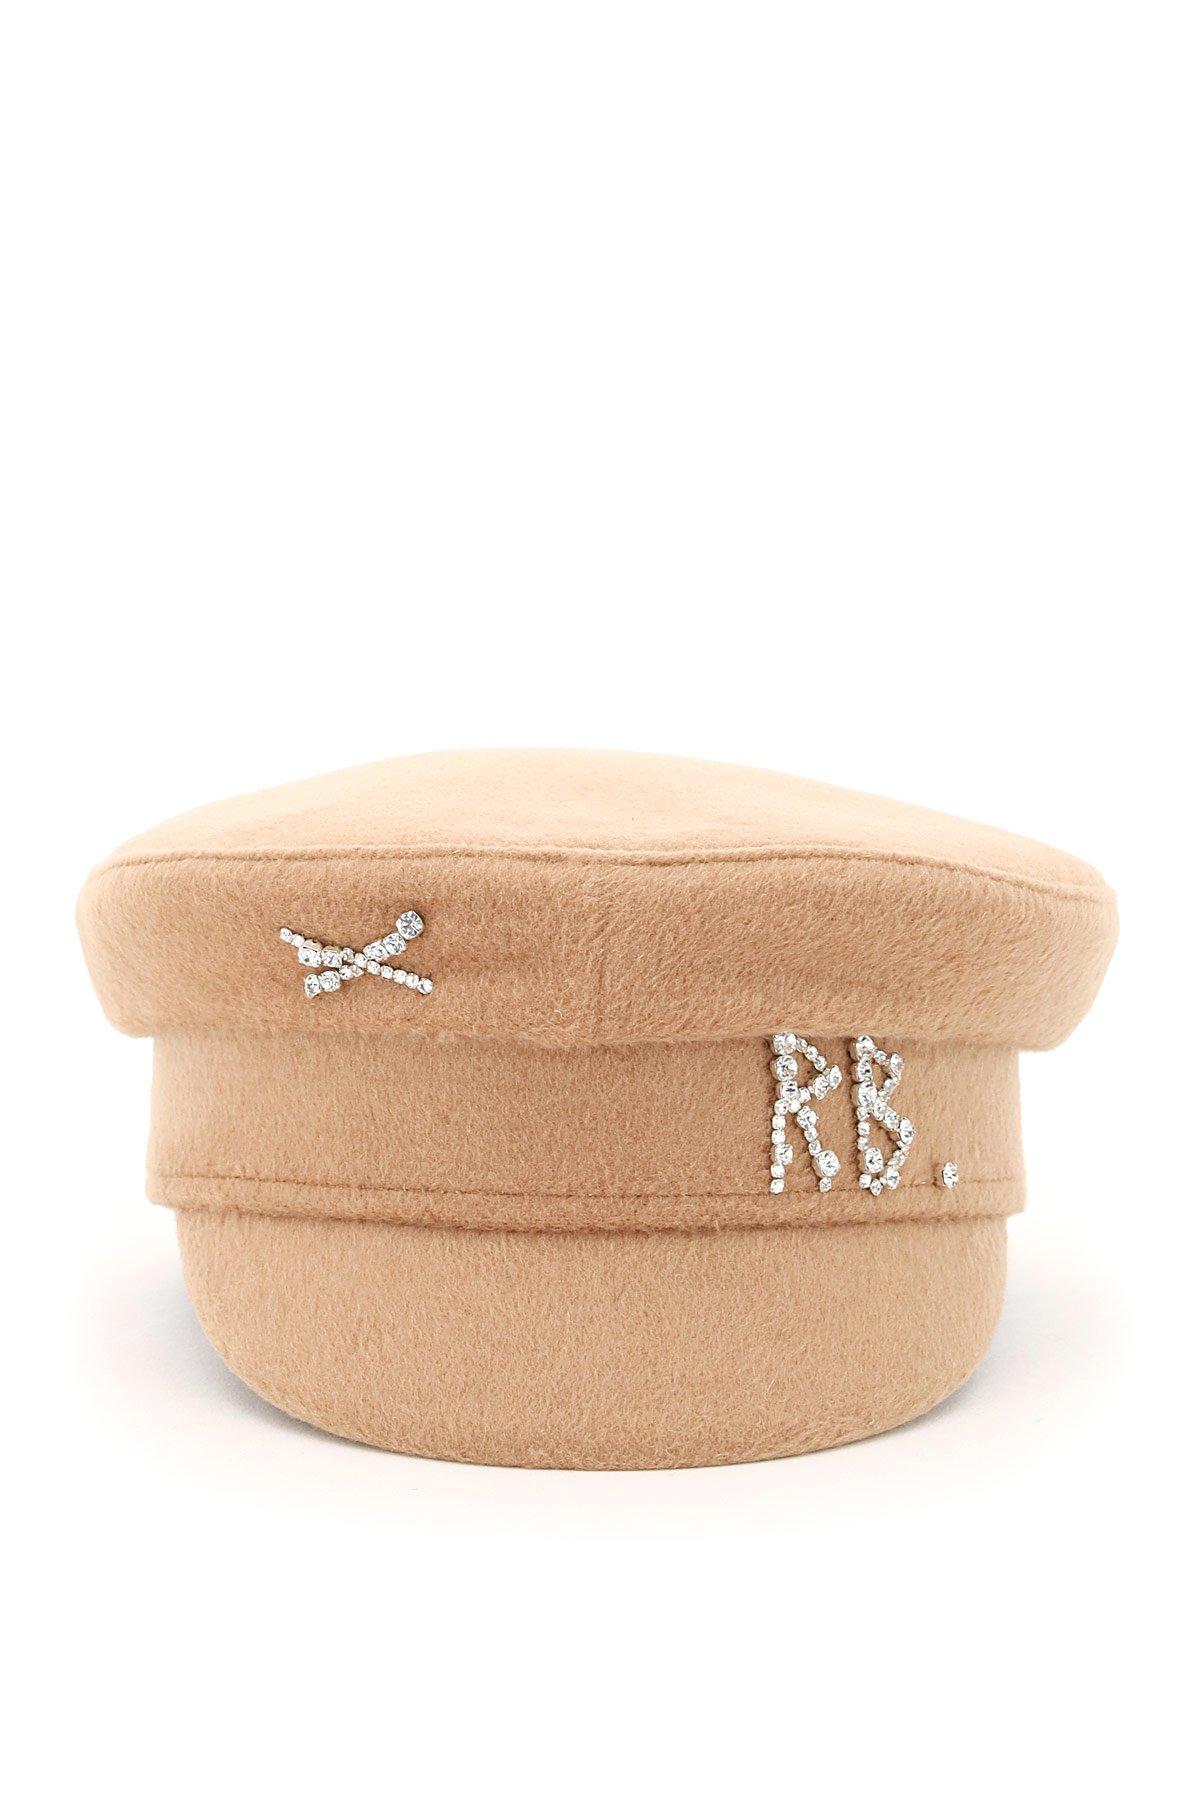 Ruslan baginskiy cappello baker boy crystal logo